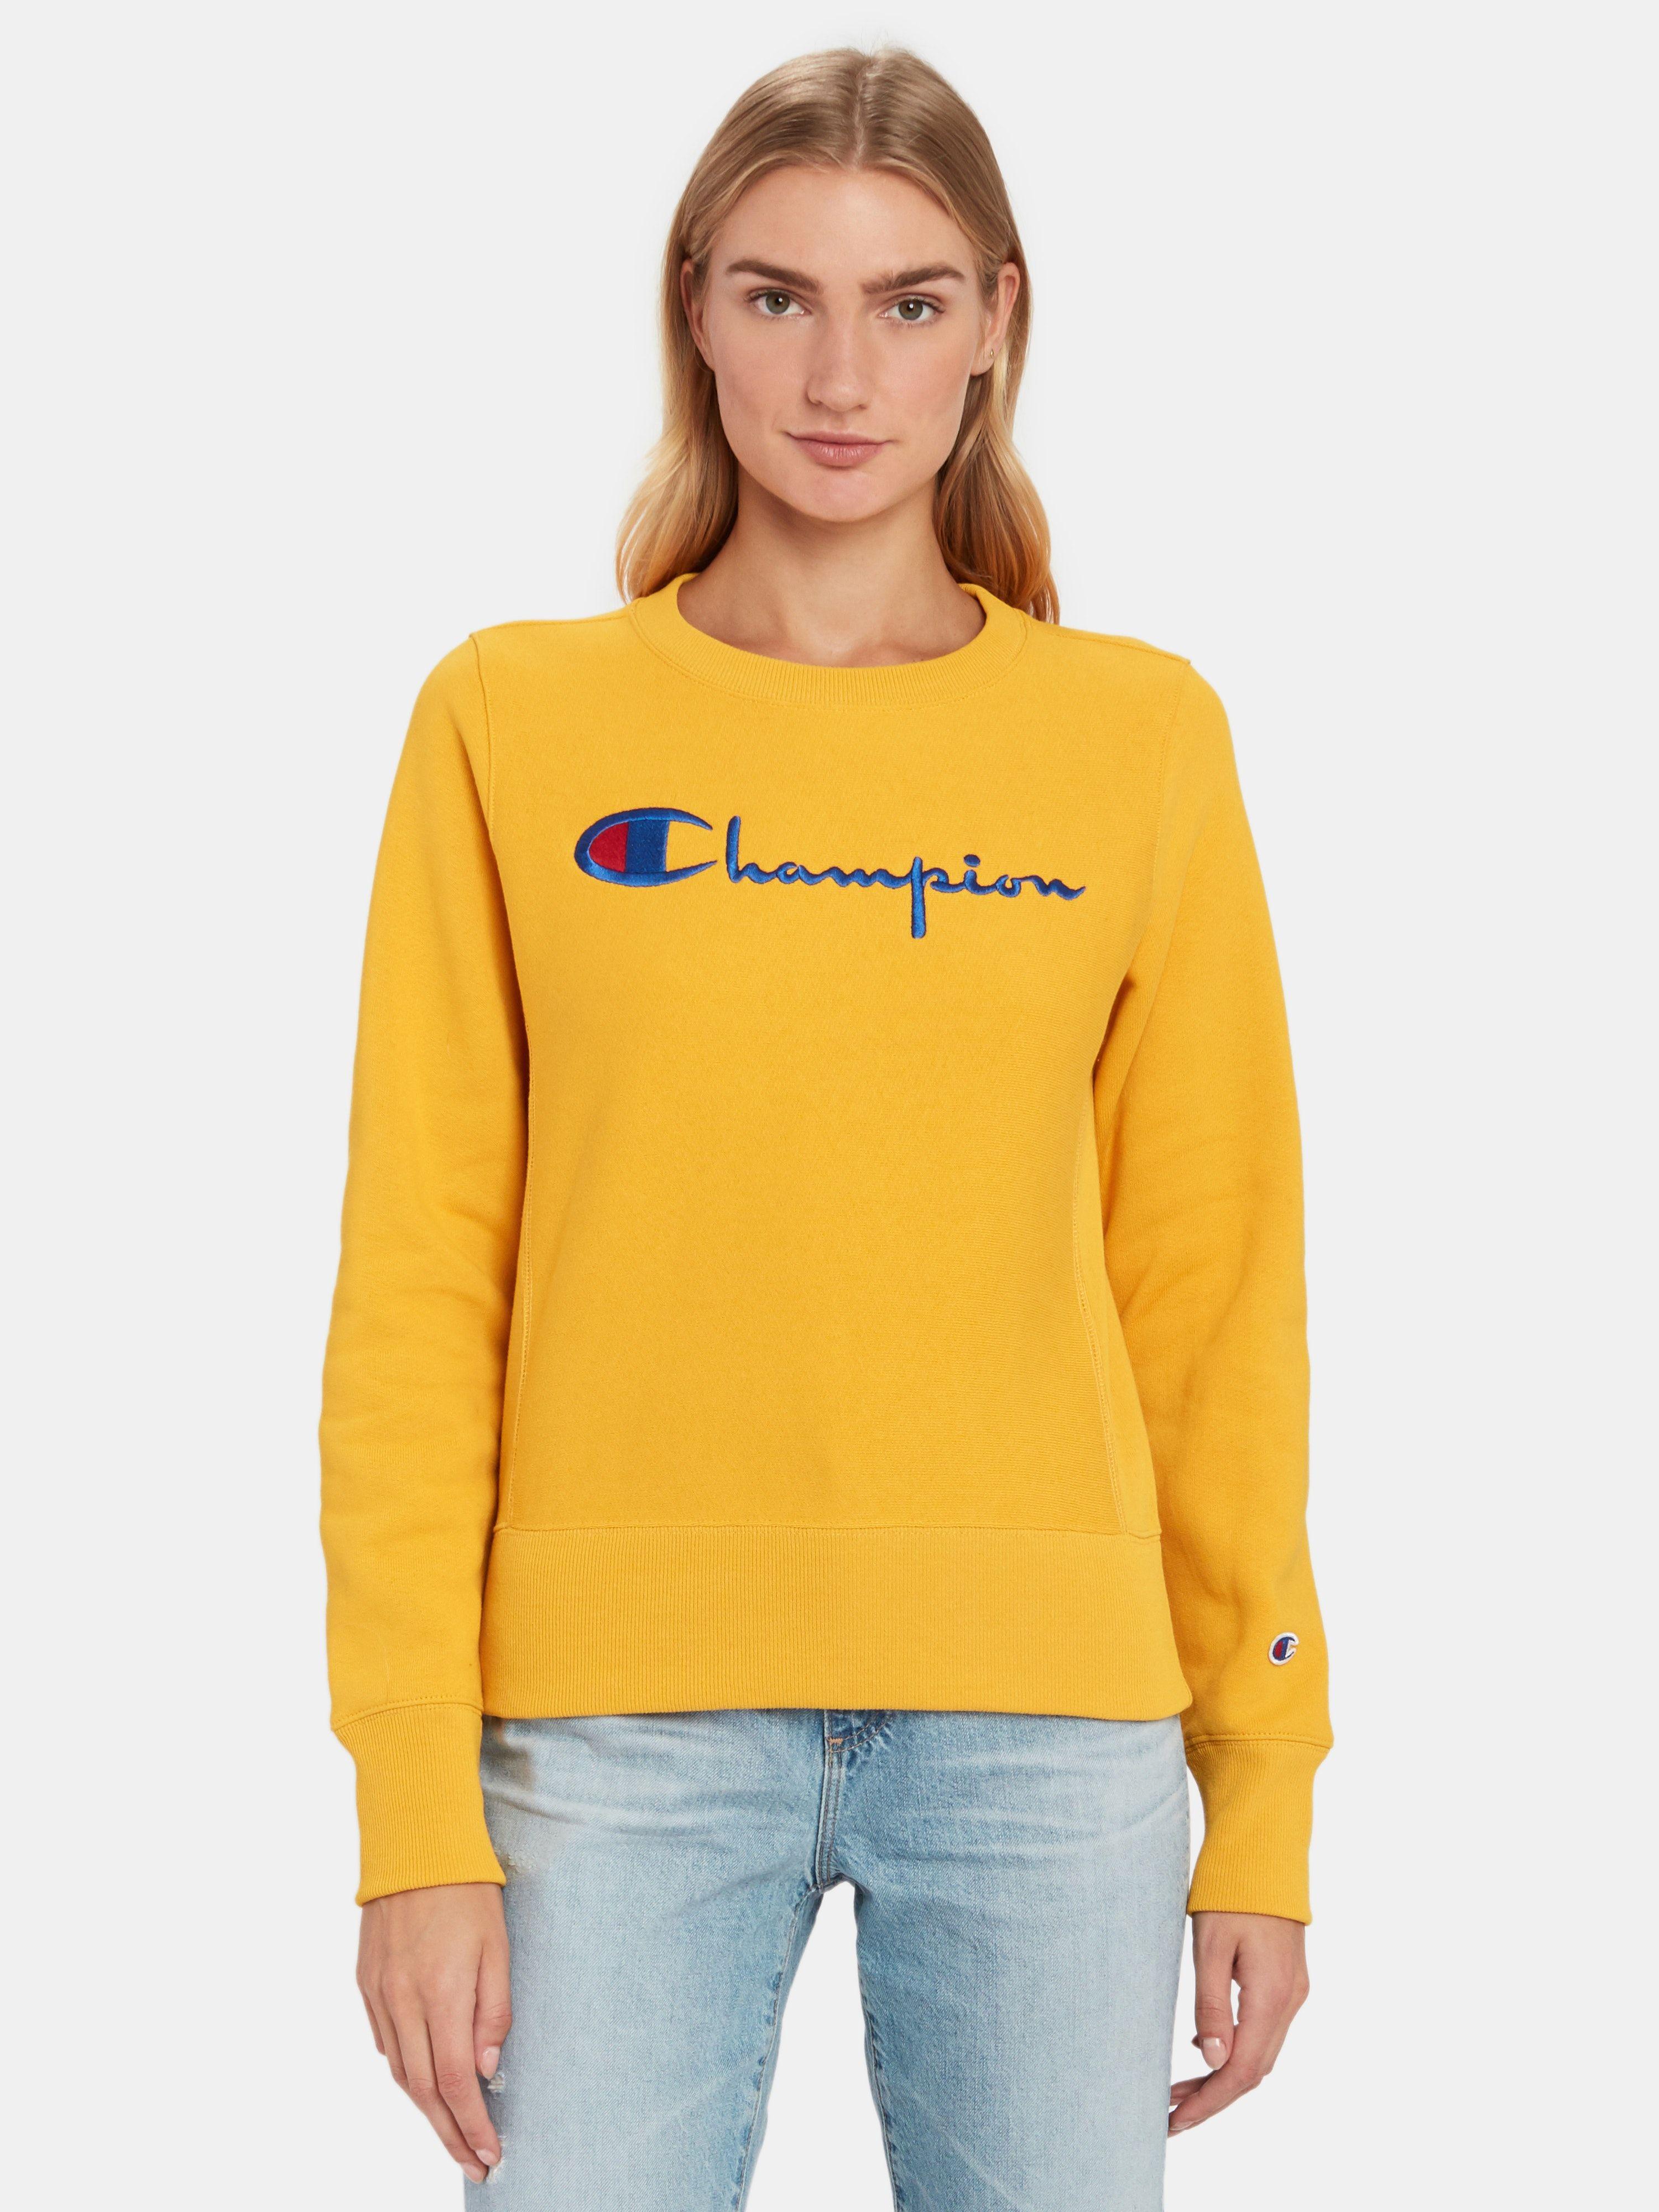 Champion Reverse Weave Big Script Crewneck Sweatshirt Powder Sunrise Yellow Xs Also In M S Xl L Sweatshirts Crew Neck Sweatshirt Champion Clothing [ 4000 x 3000 Pixel ]